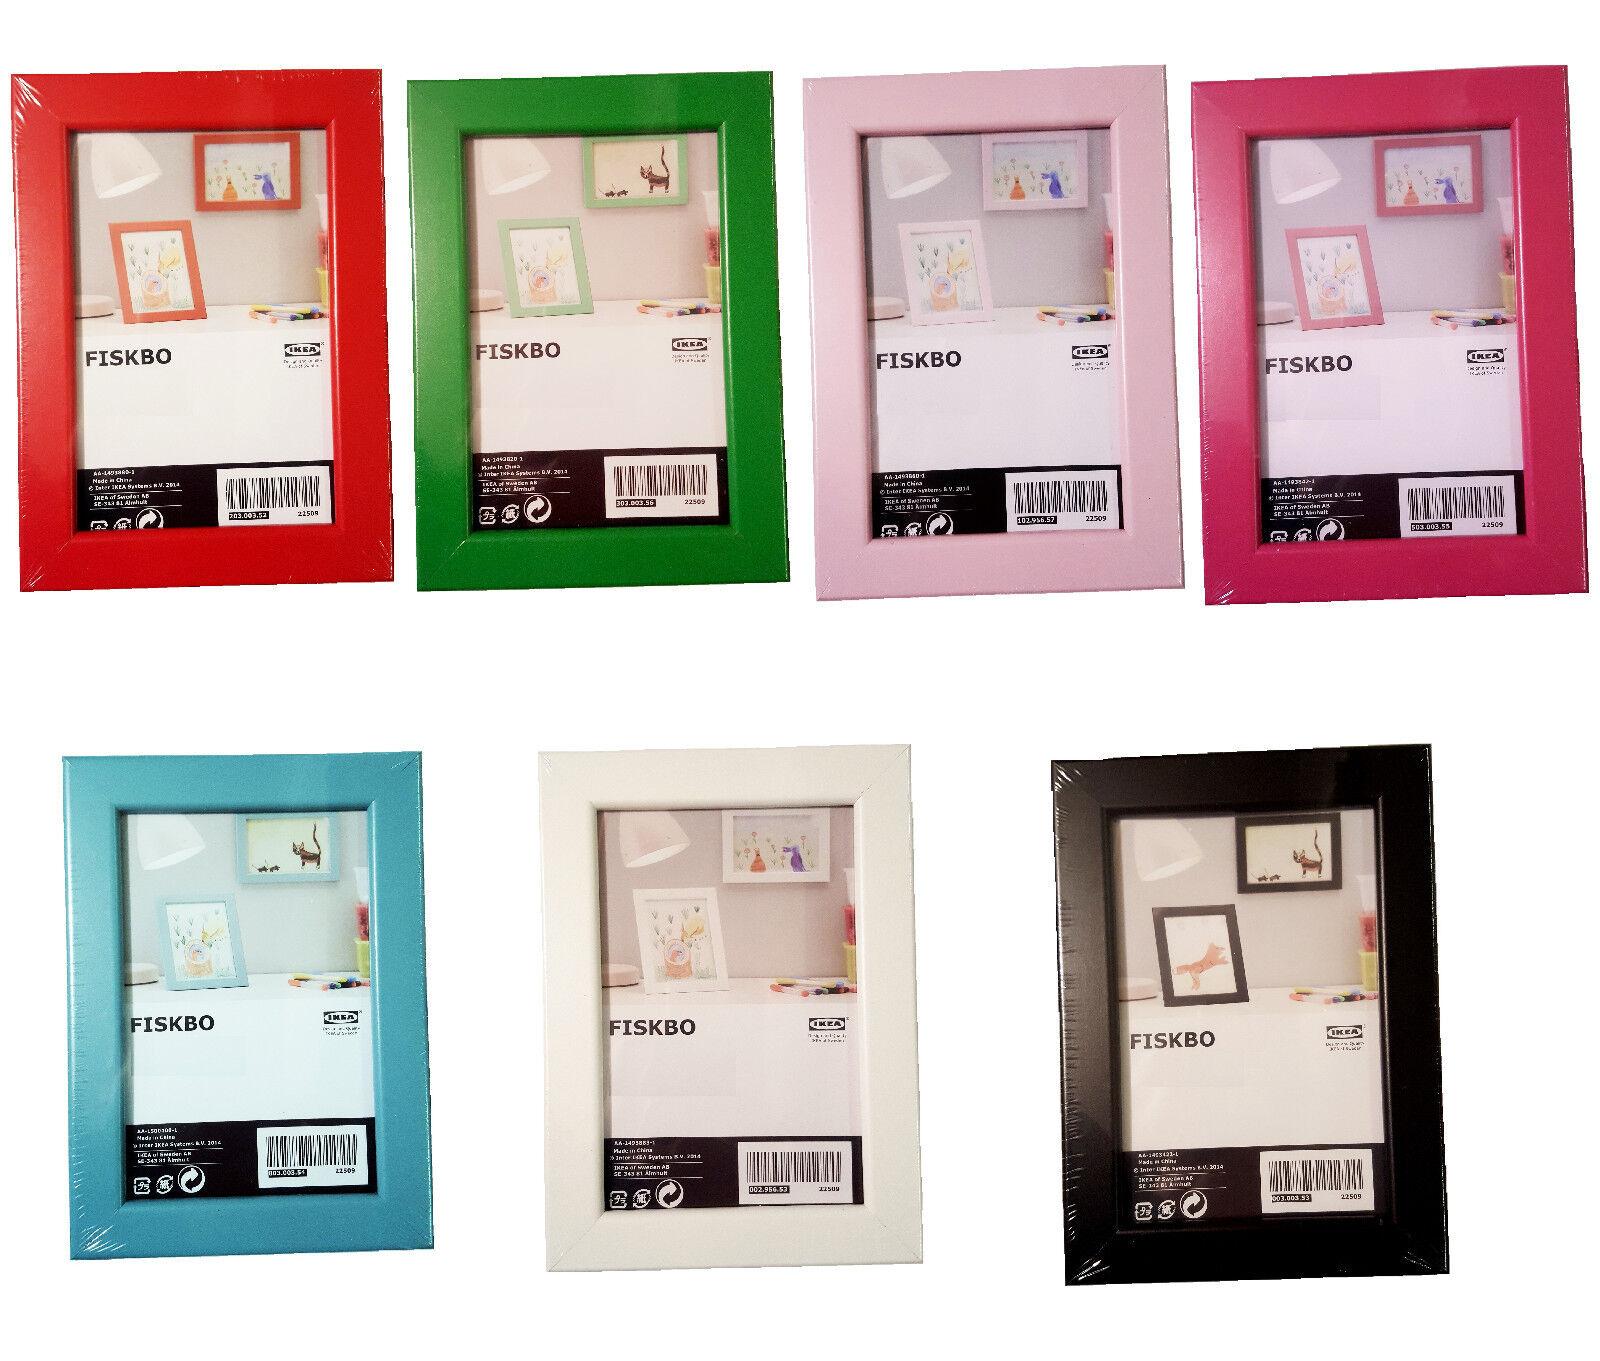 IKEA FISKBO Bilderrahmen / Fotorahmen 10x15 cm /13x18 cm /21x30 cm ...